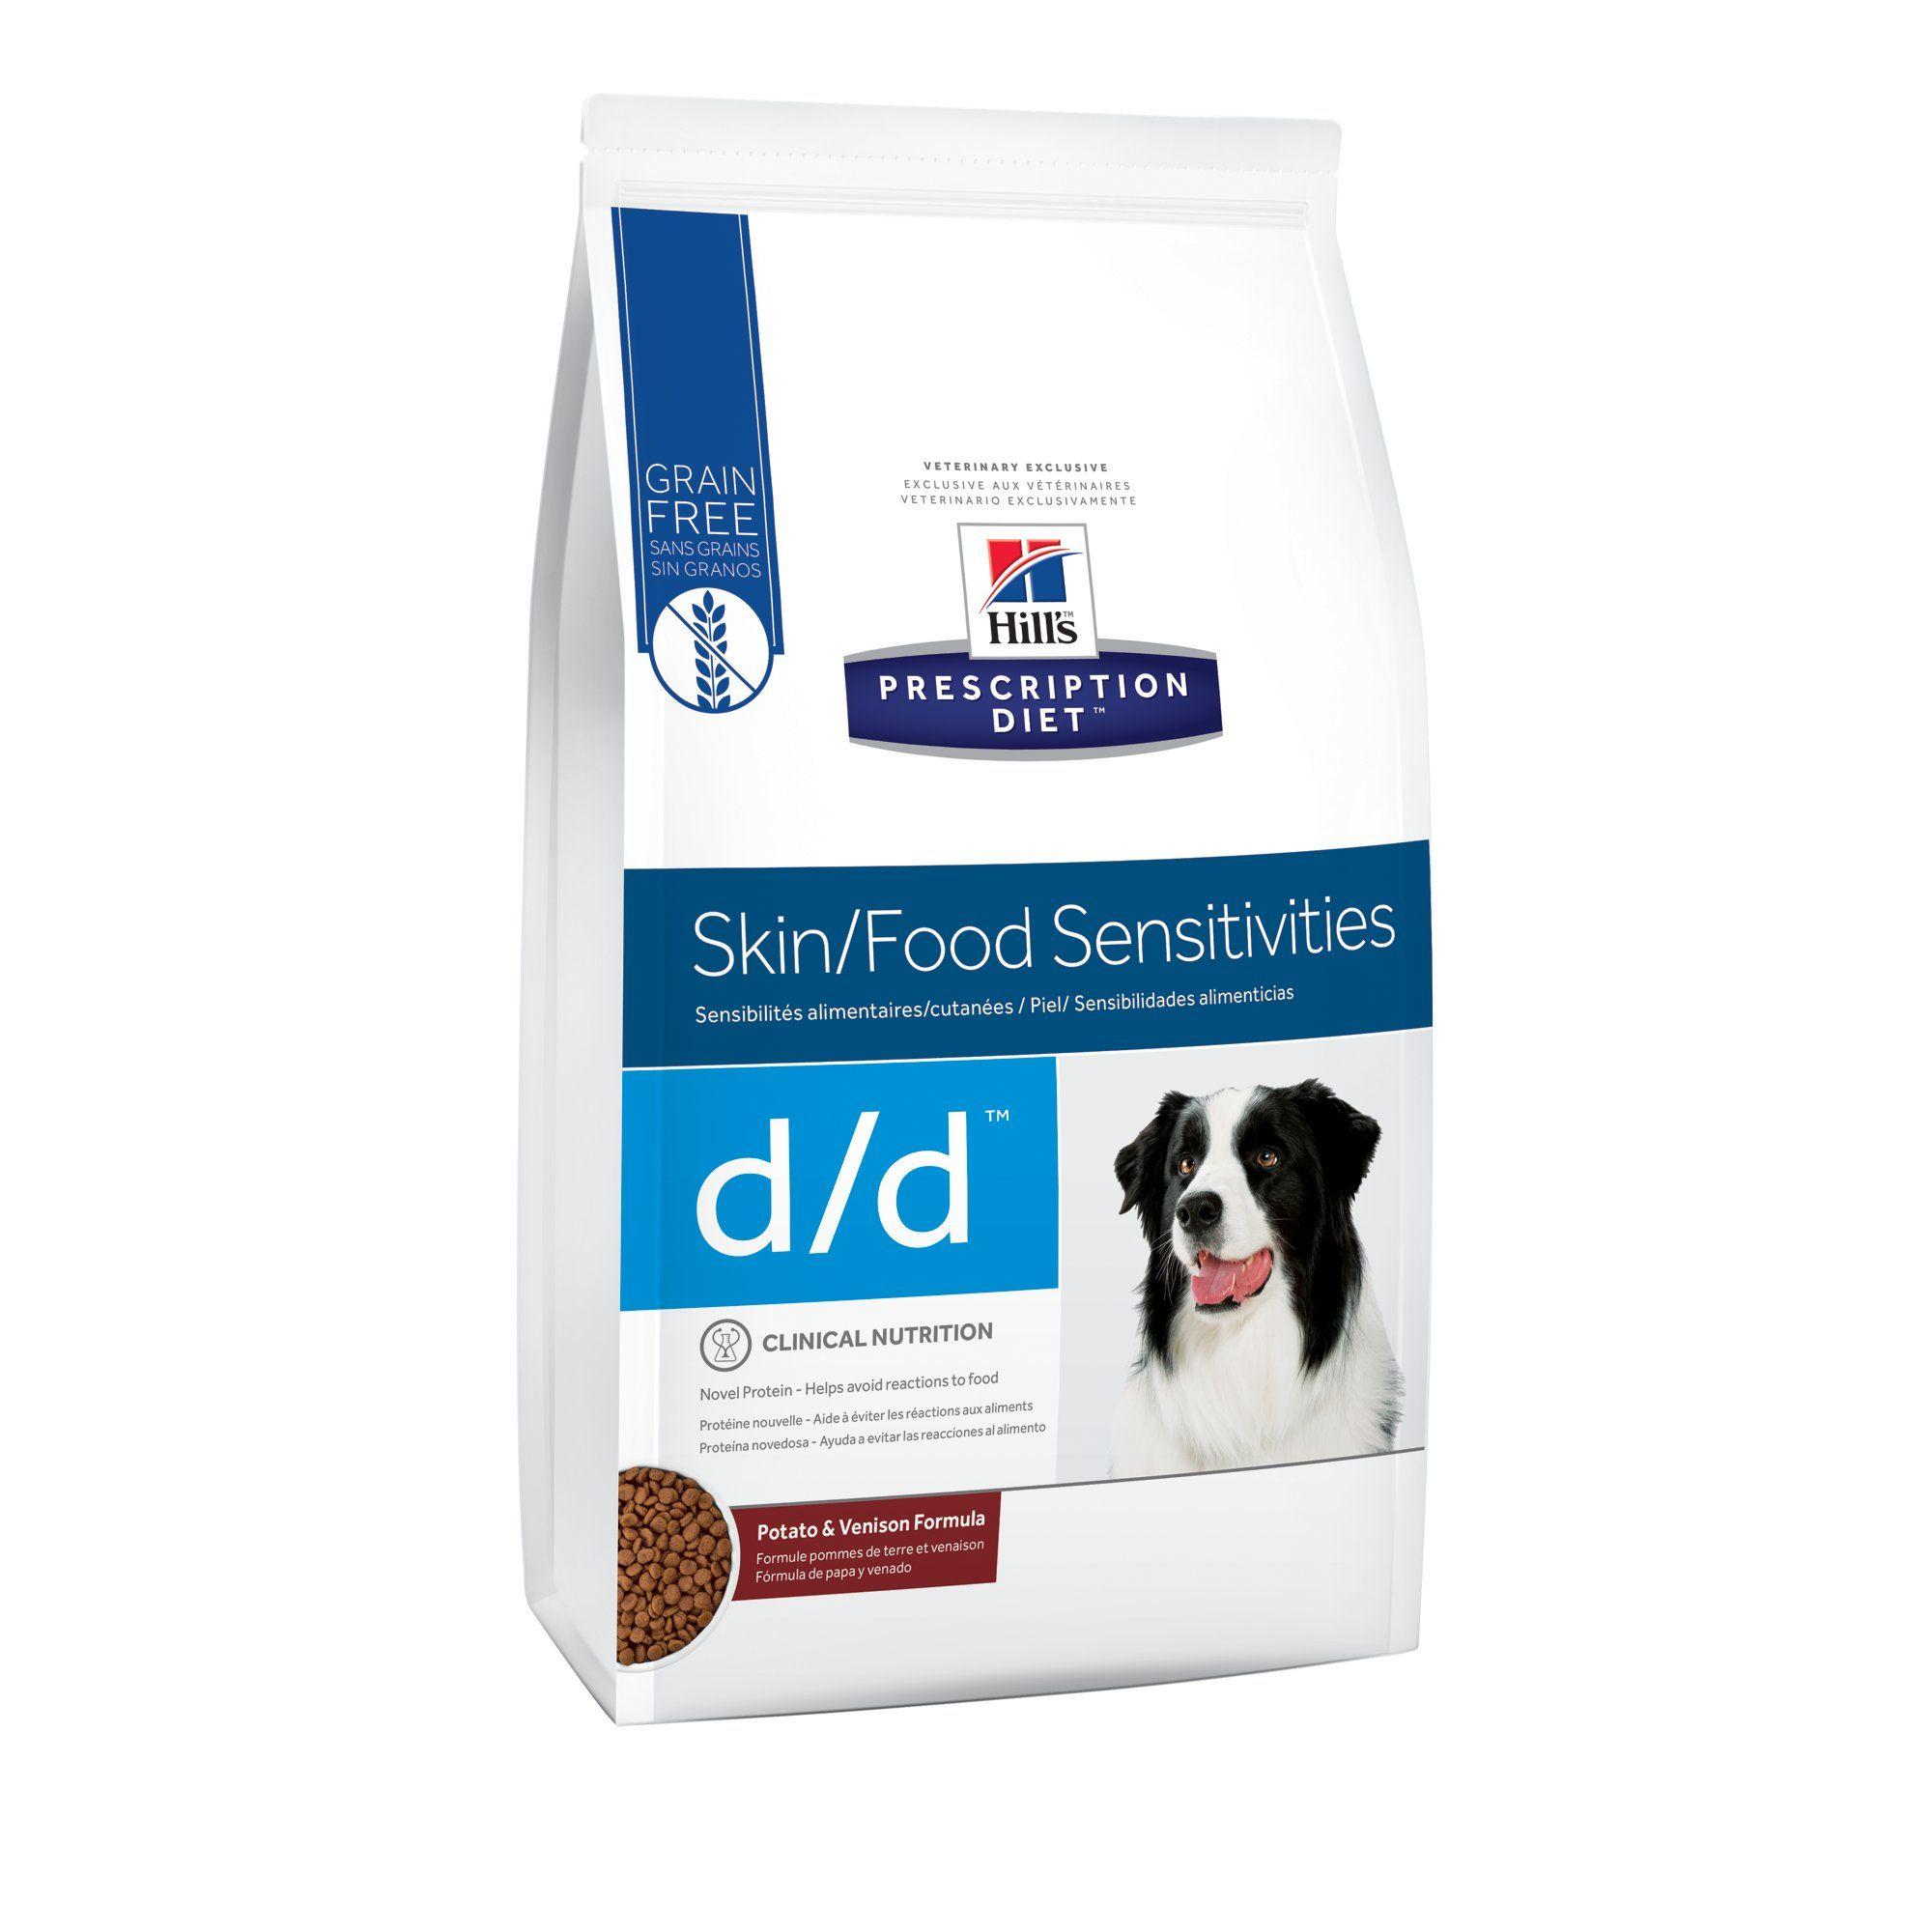 Hills prescription diet dd skinfood sensitivities